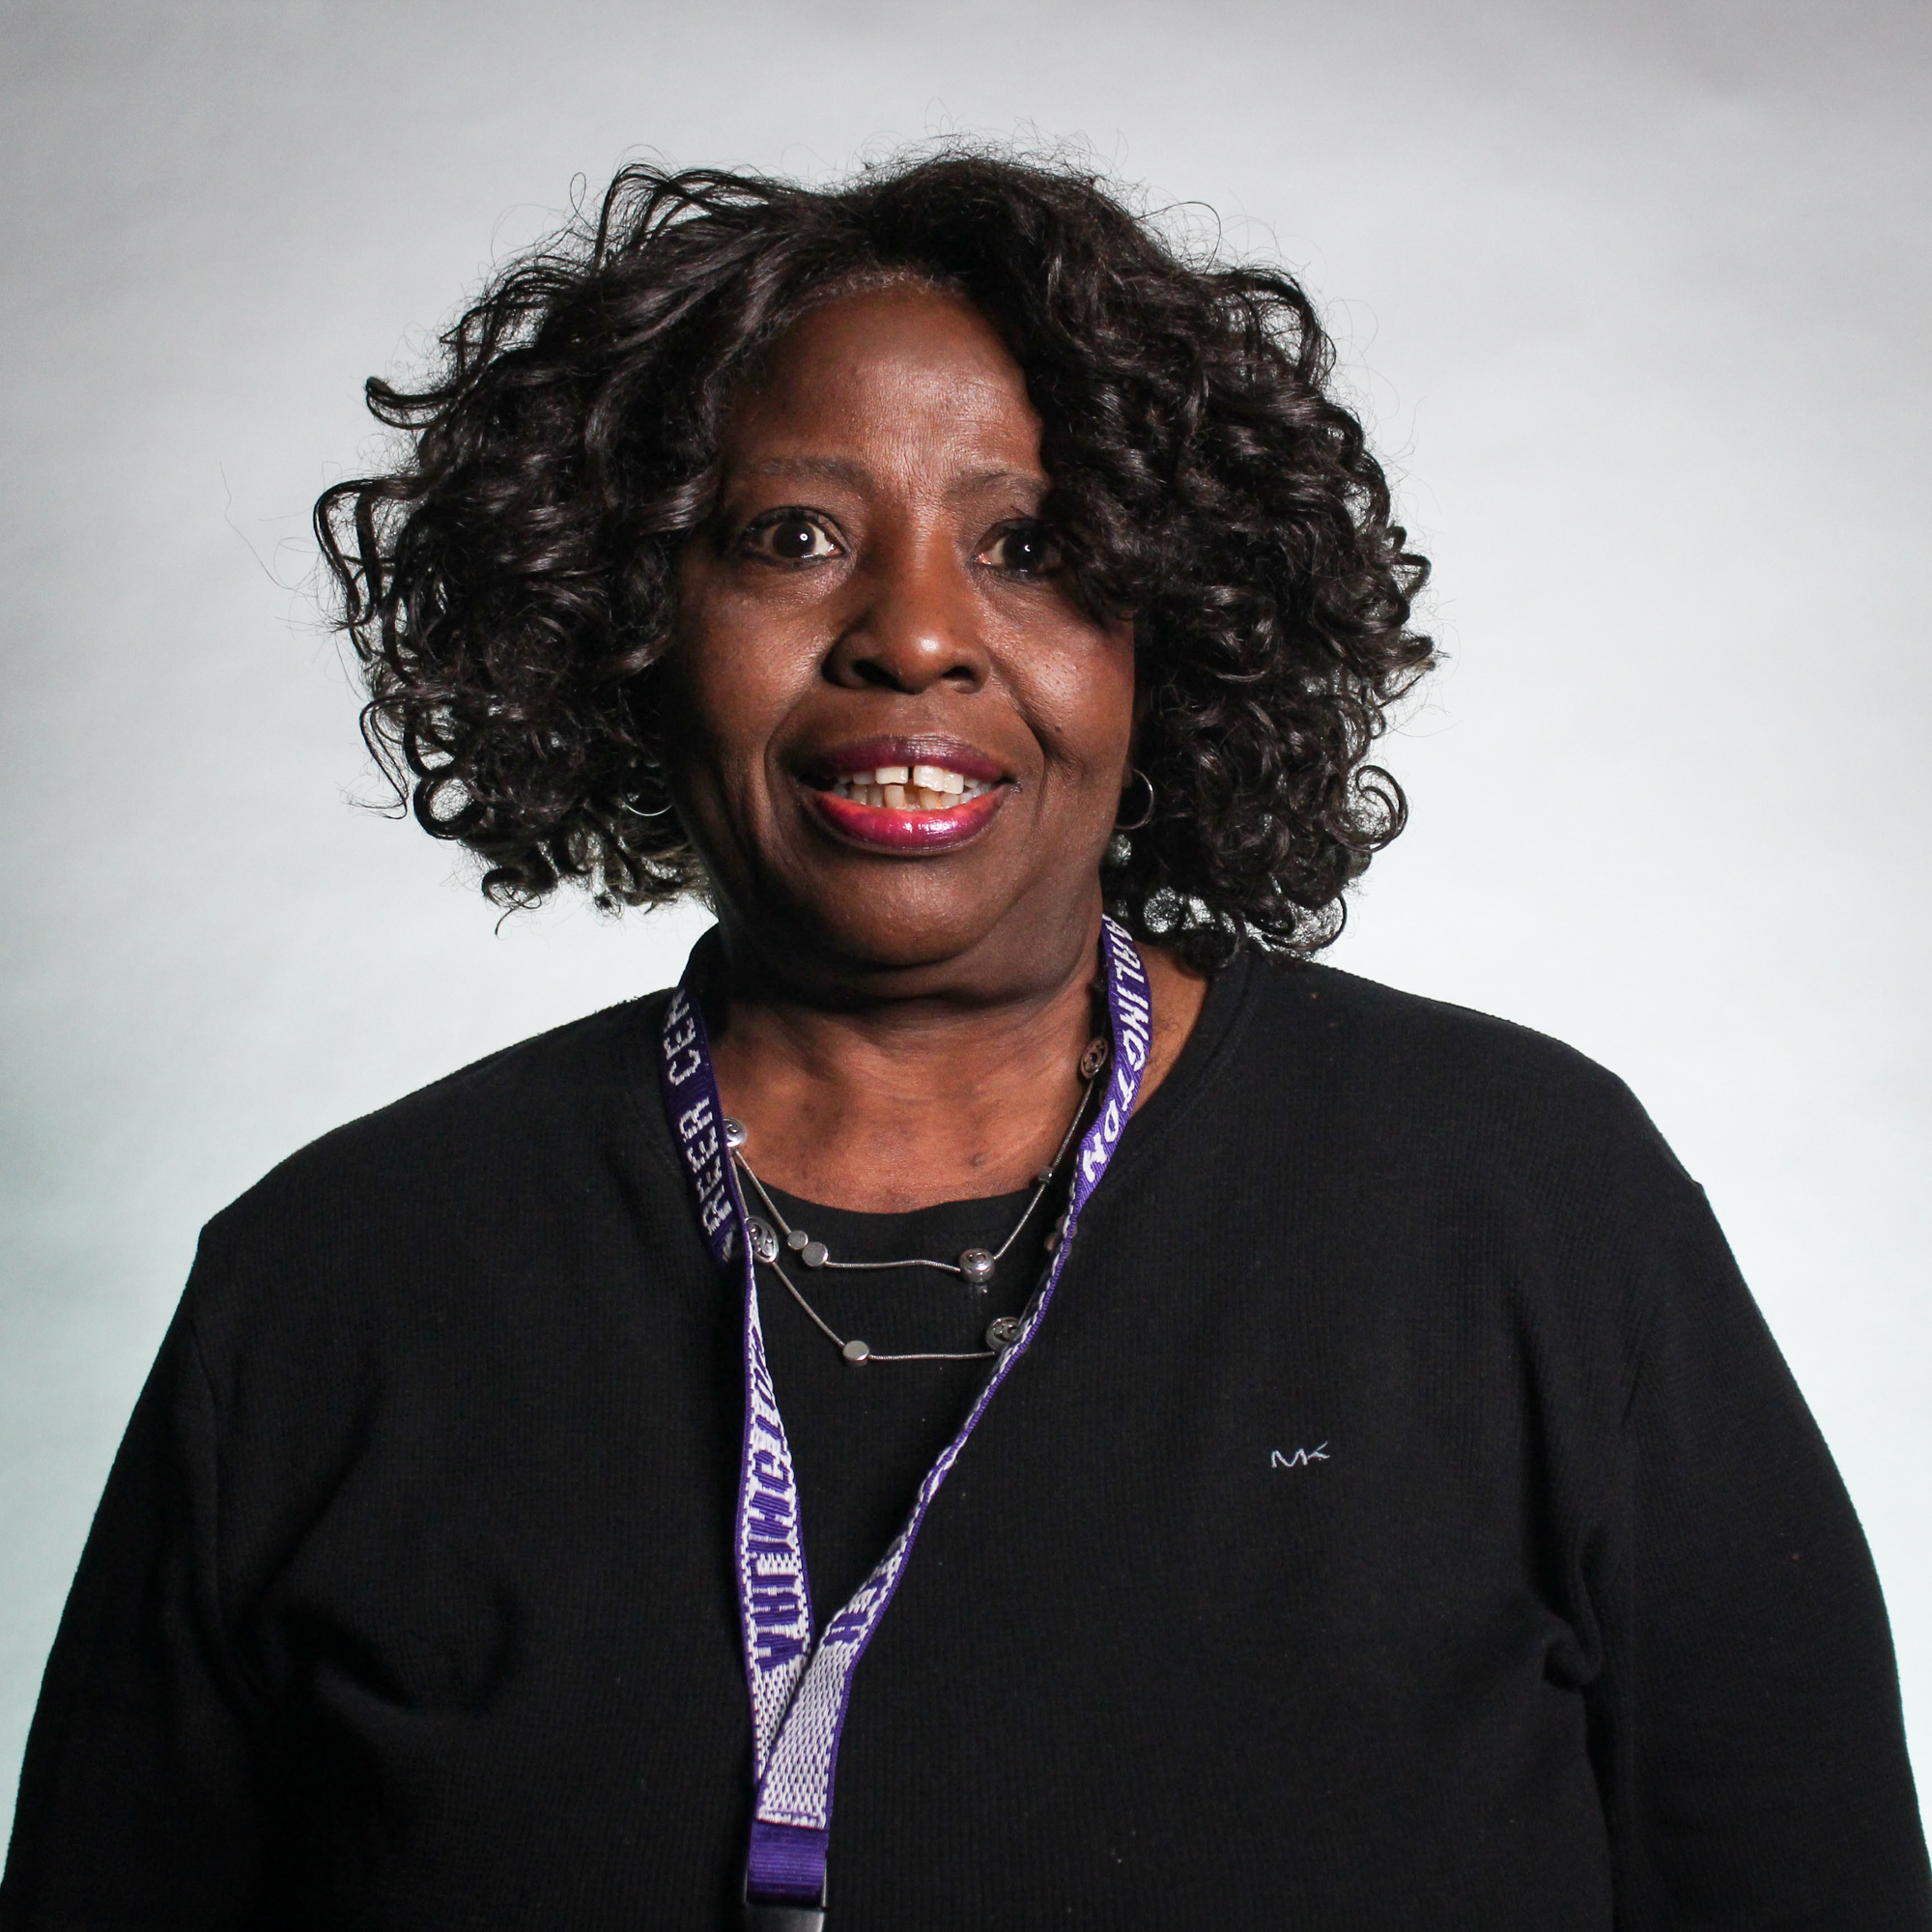 Ms. Rosenia Peake